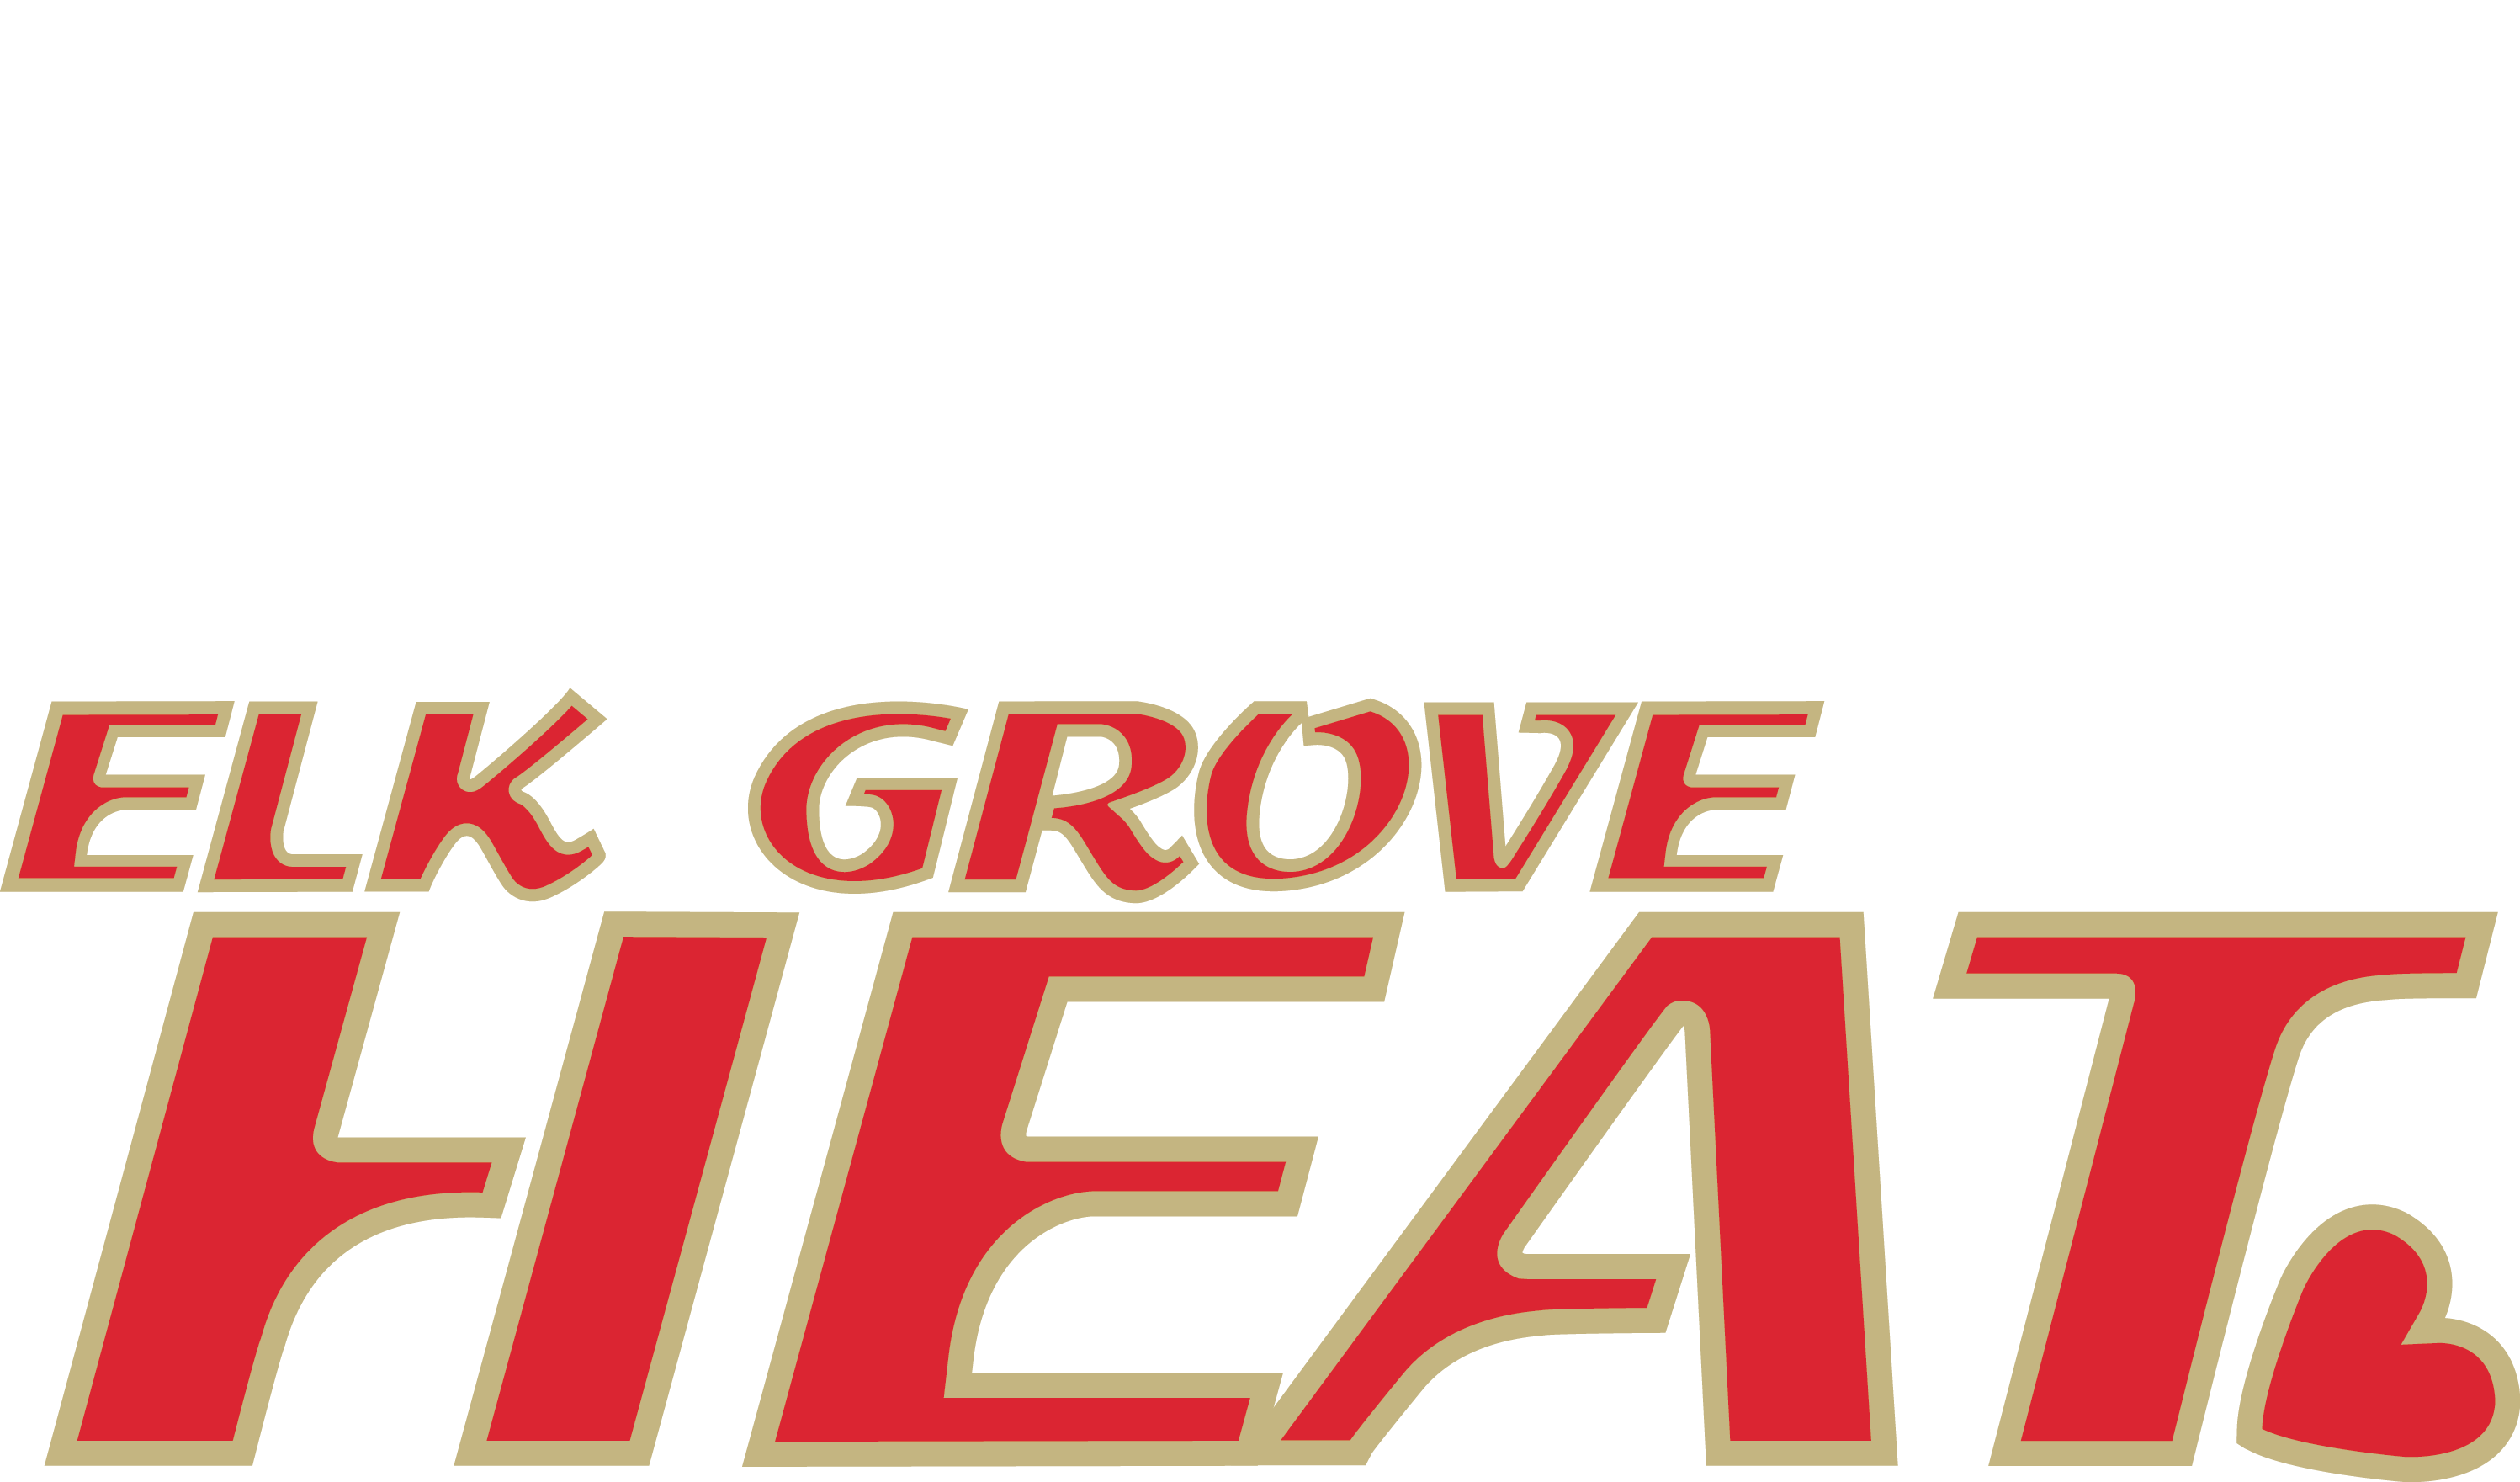 USSSA | USA Elite Select Team: Elk Grove Heat 11u 06 - Elk